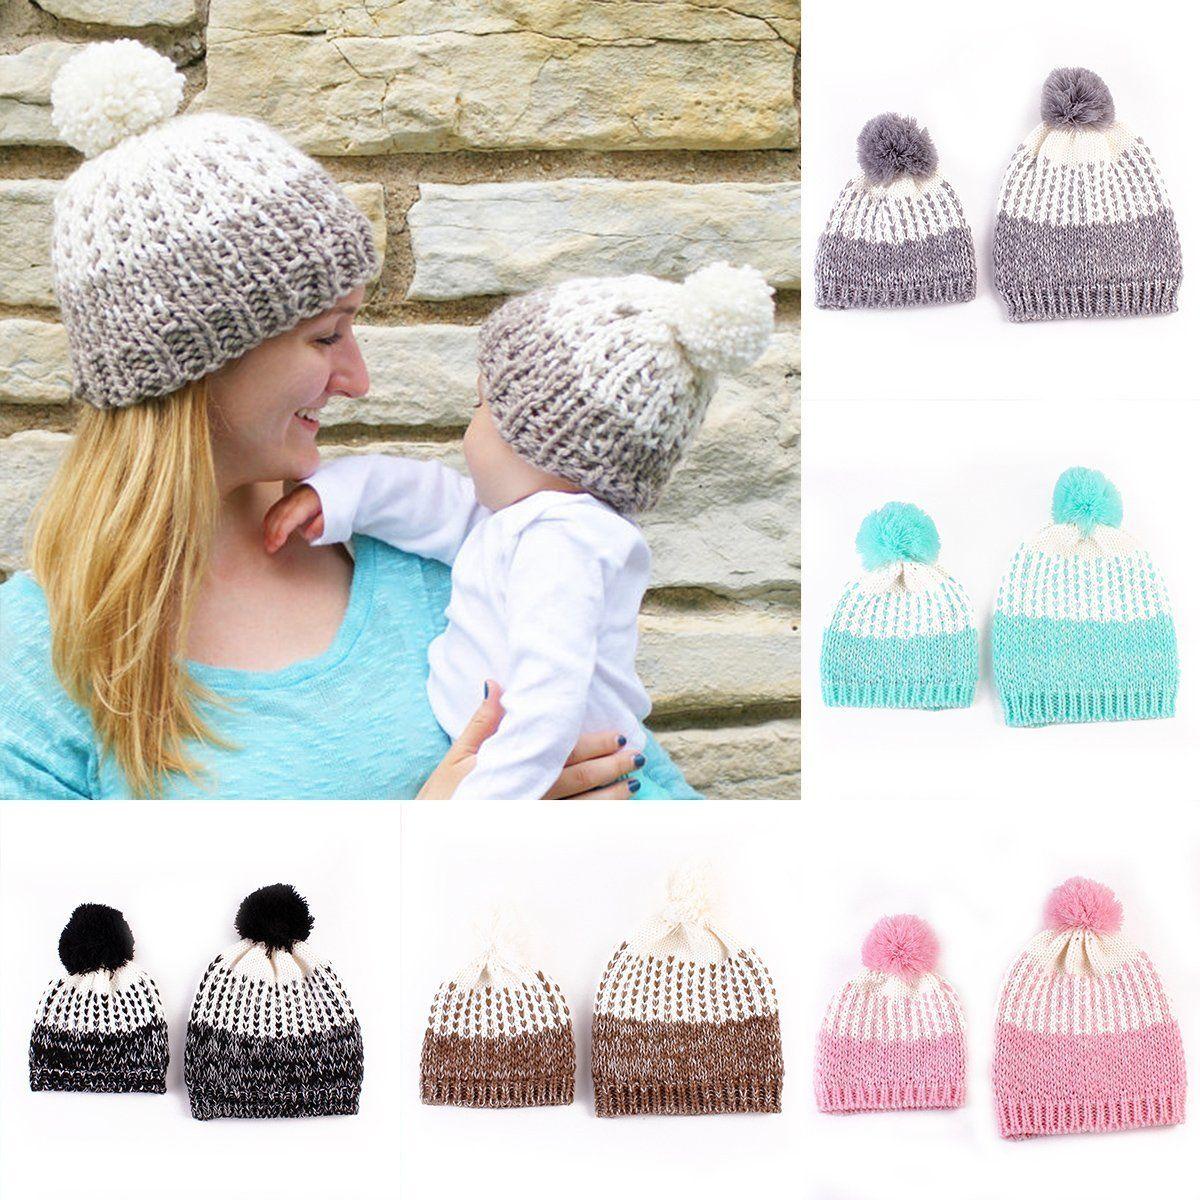 67ddfd7e33f 3.68AUD - 2Pcs Winter Warm Momborn Baby Boy Girl Hats Crochet Knit Hairball  Beanie Cap  ebay  Fashion